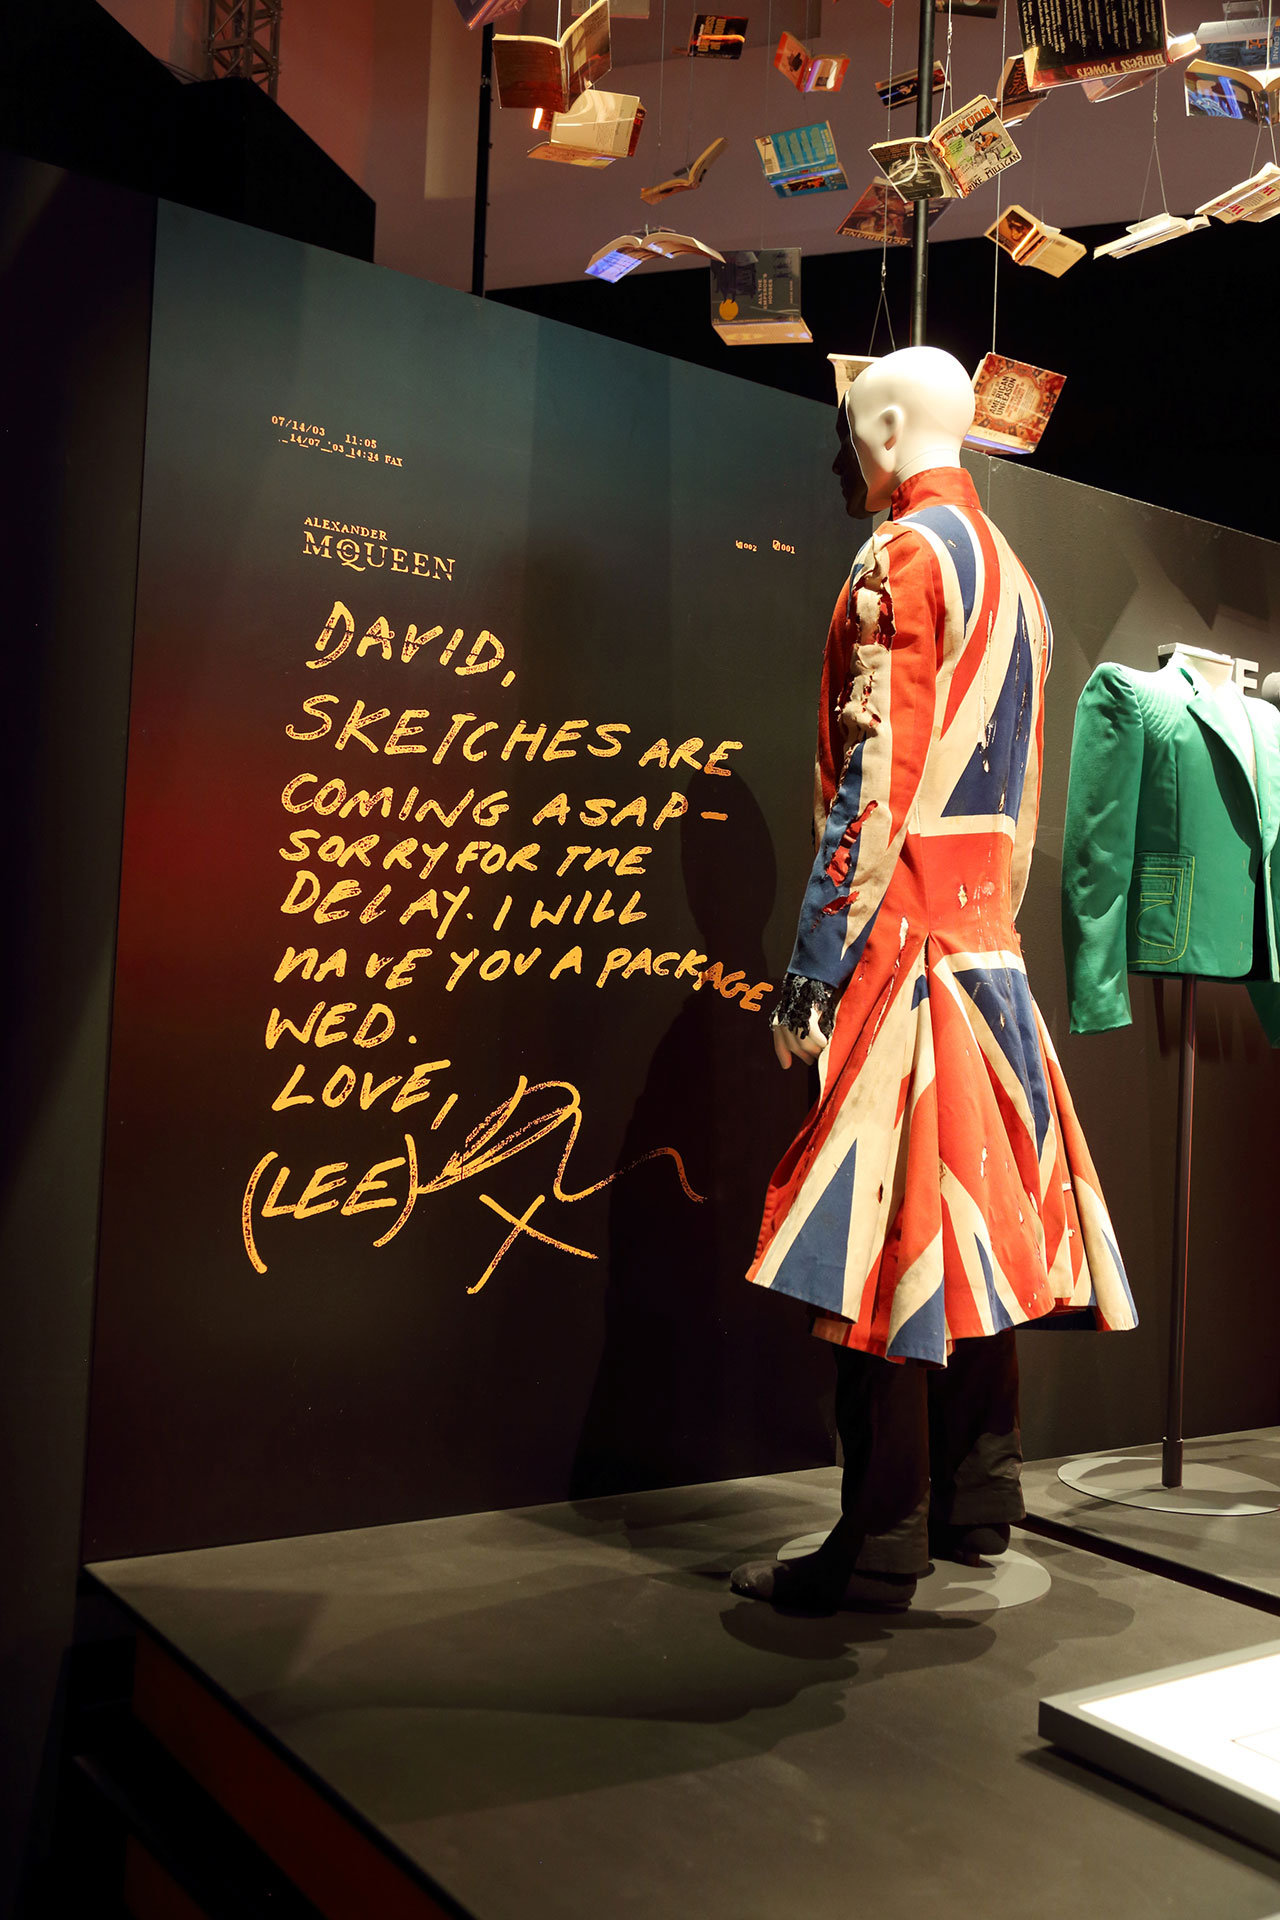 Alexander Mcqueen とのコラボで製作されたユニオンジャックのコート。横には McQueen 直筆のメモが拡大して展示されている | © Eikon / G.Perticoni